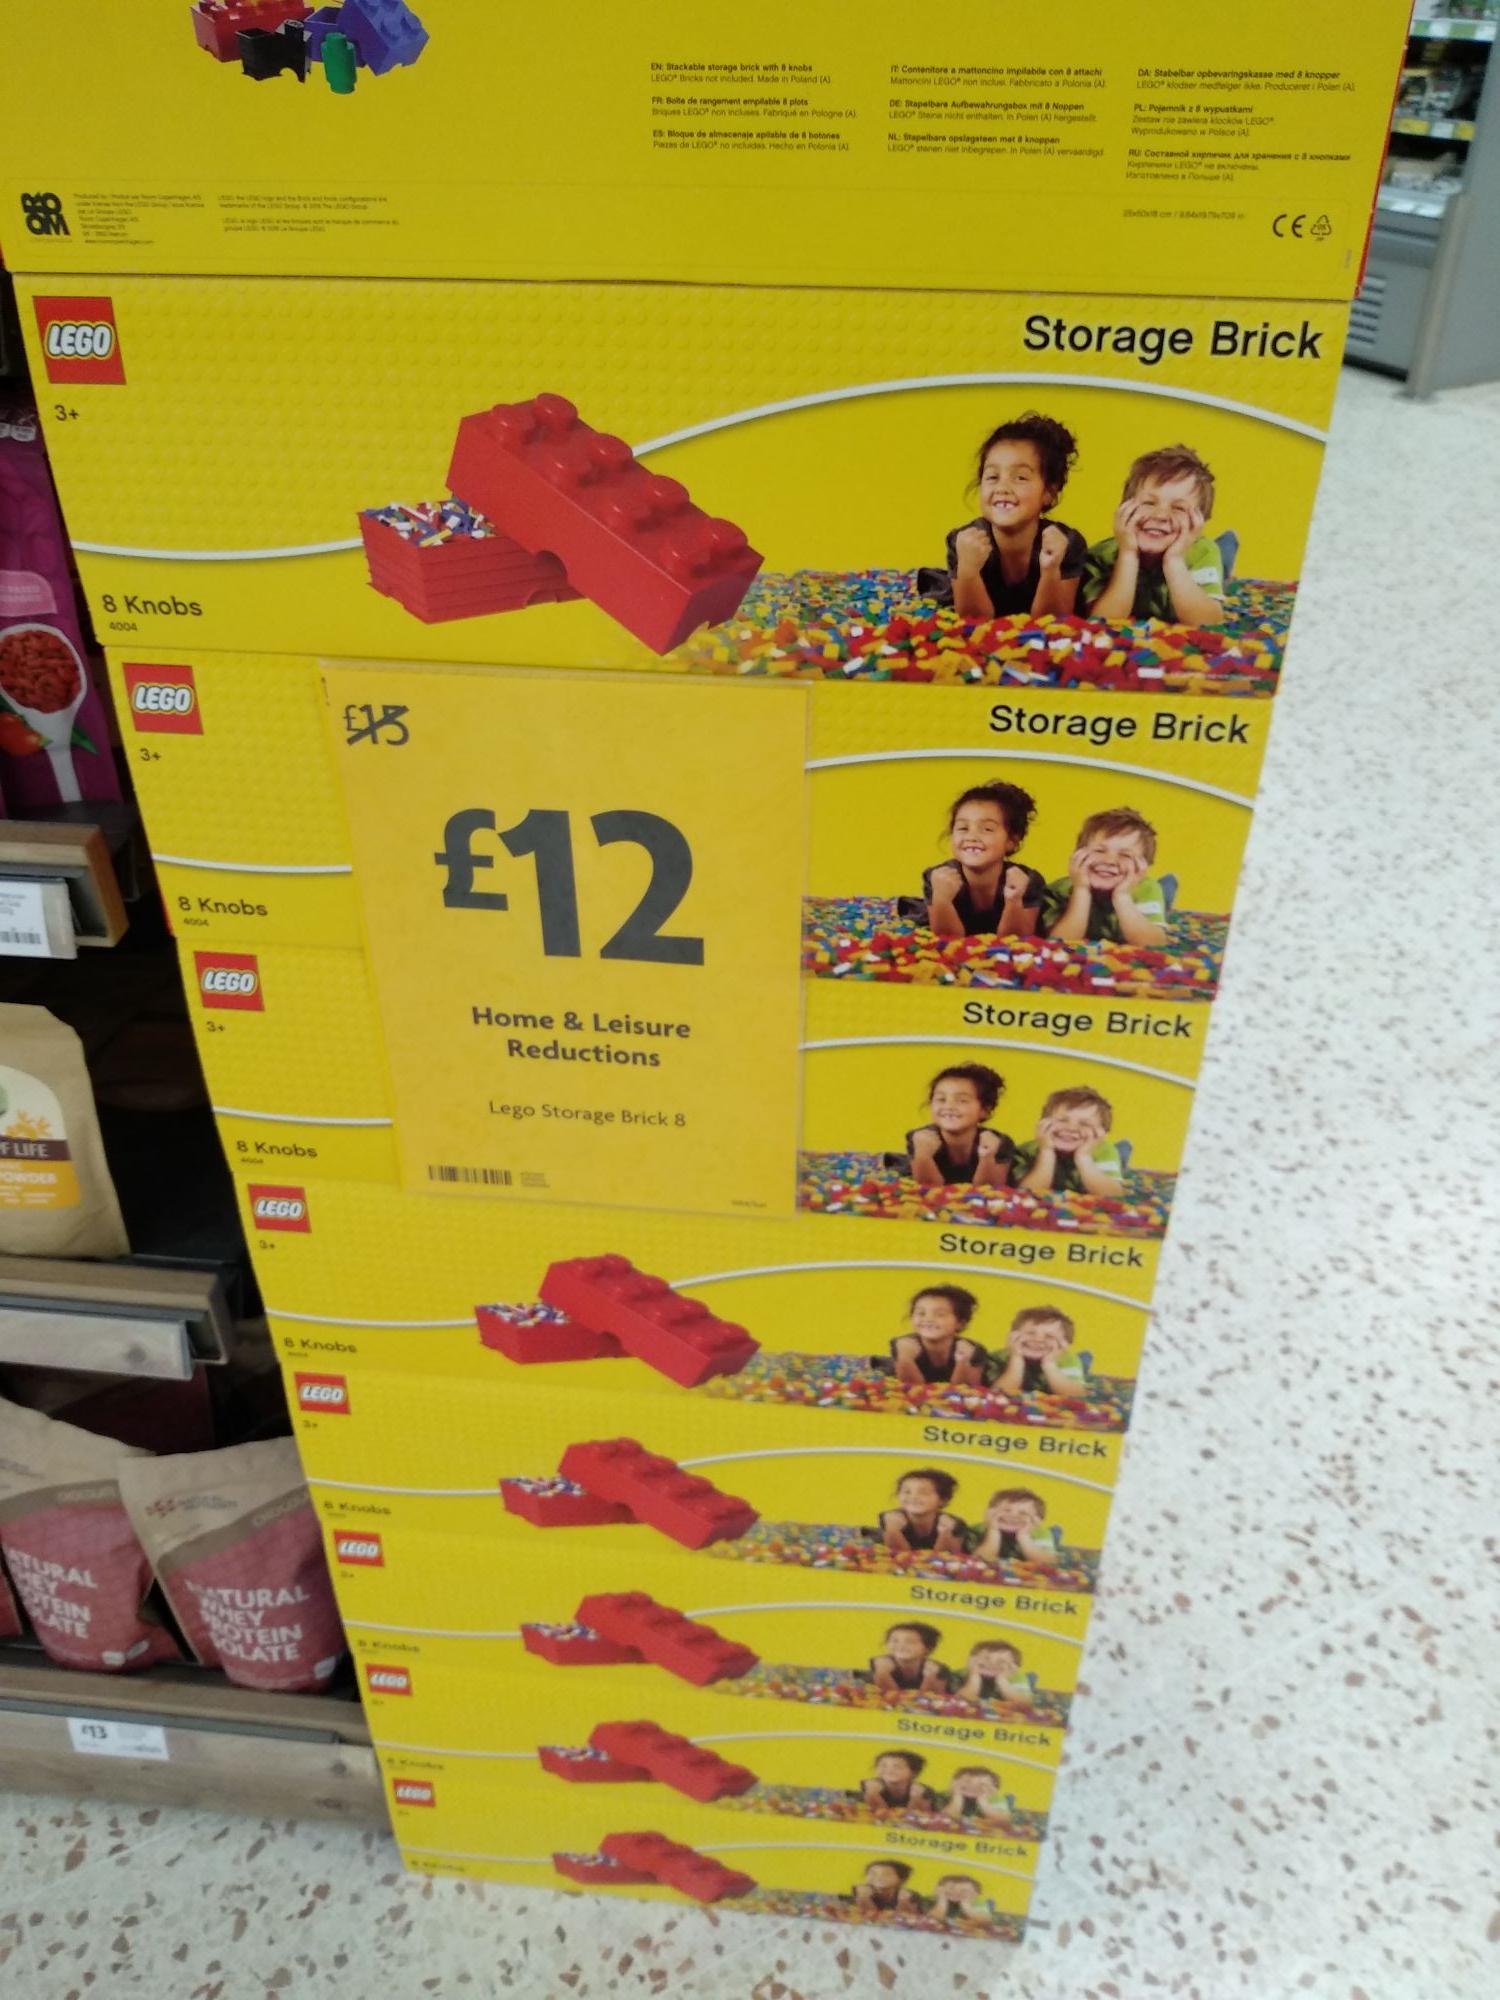 Lego storage brick 8 knobs - £12 instore @ Morrison's